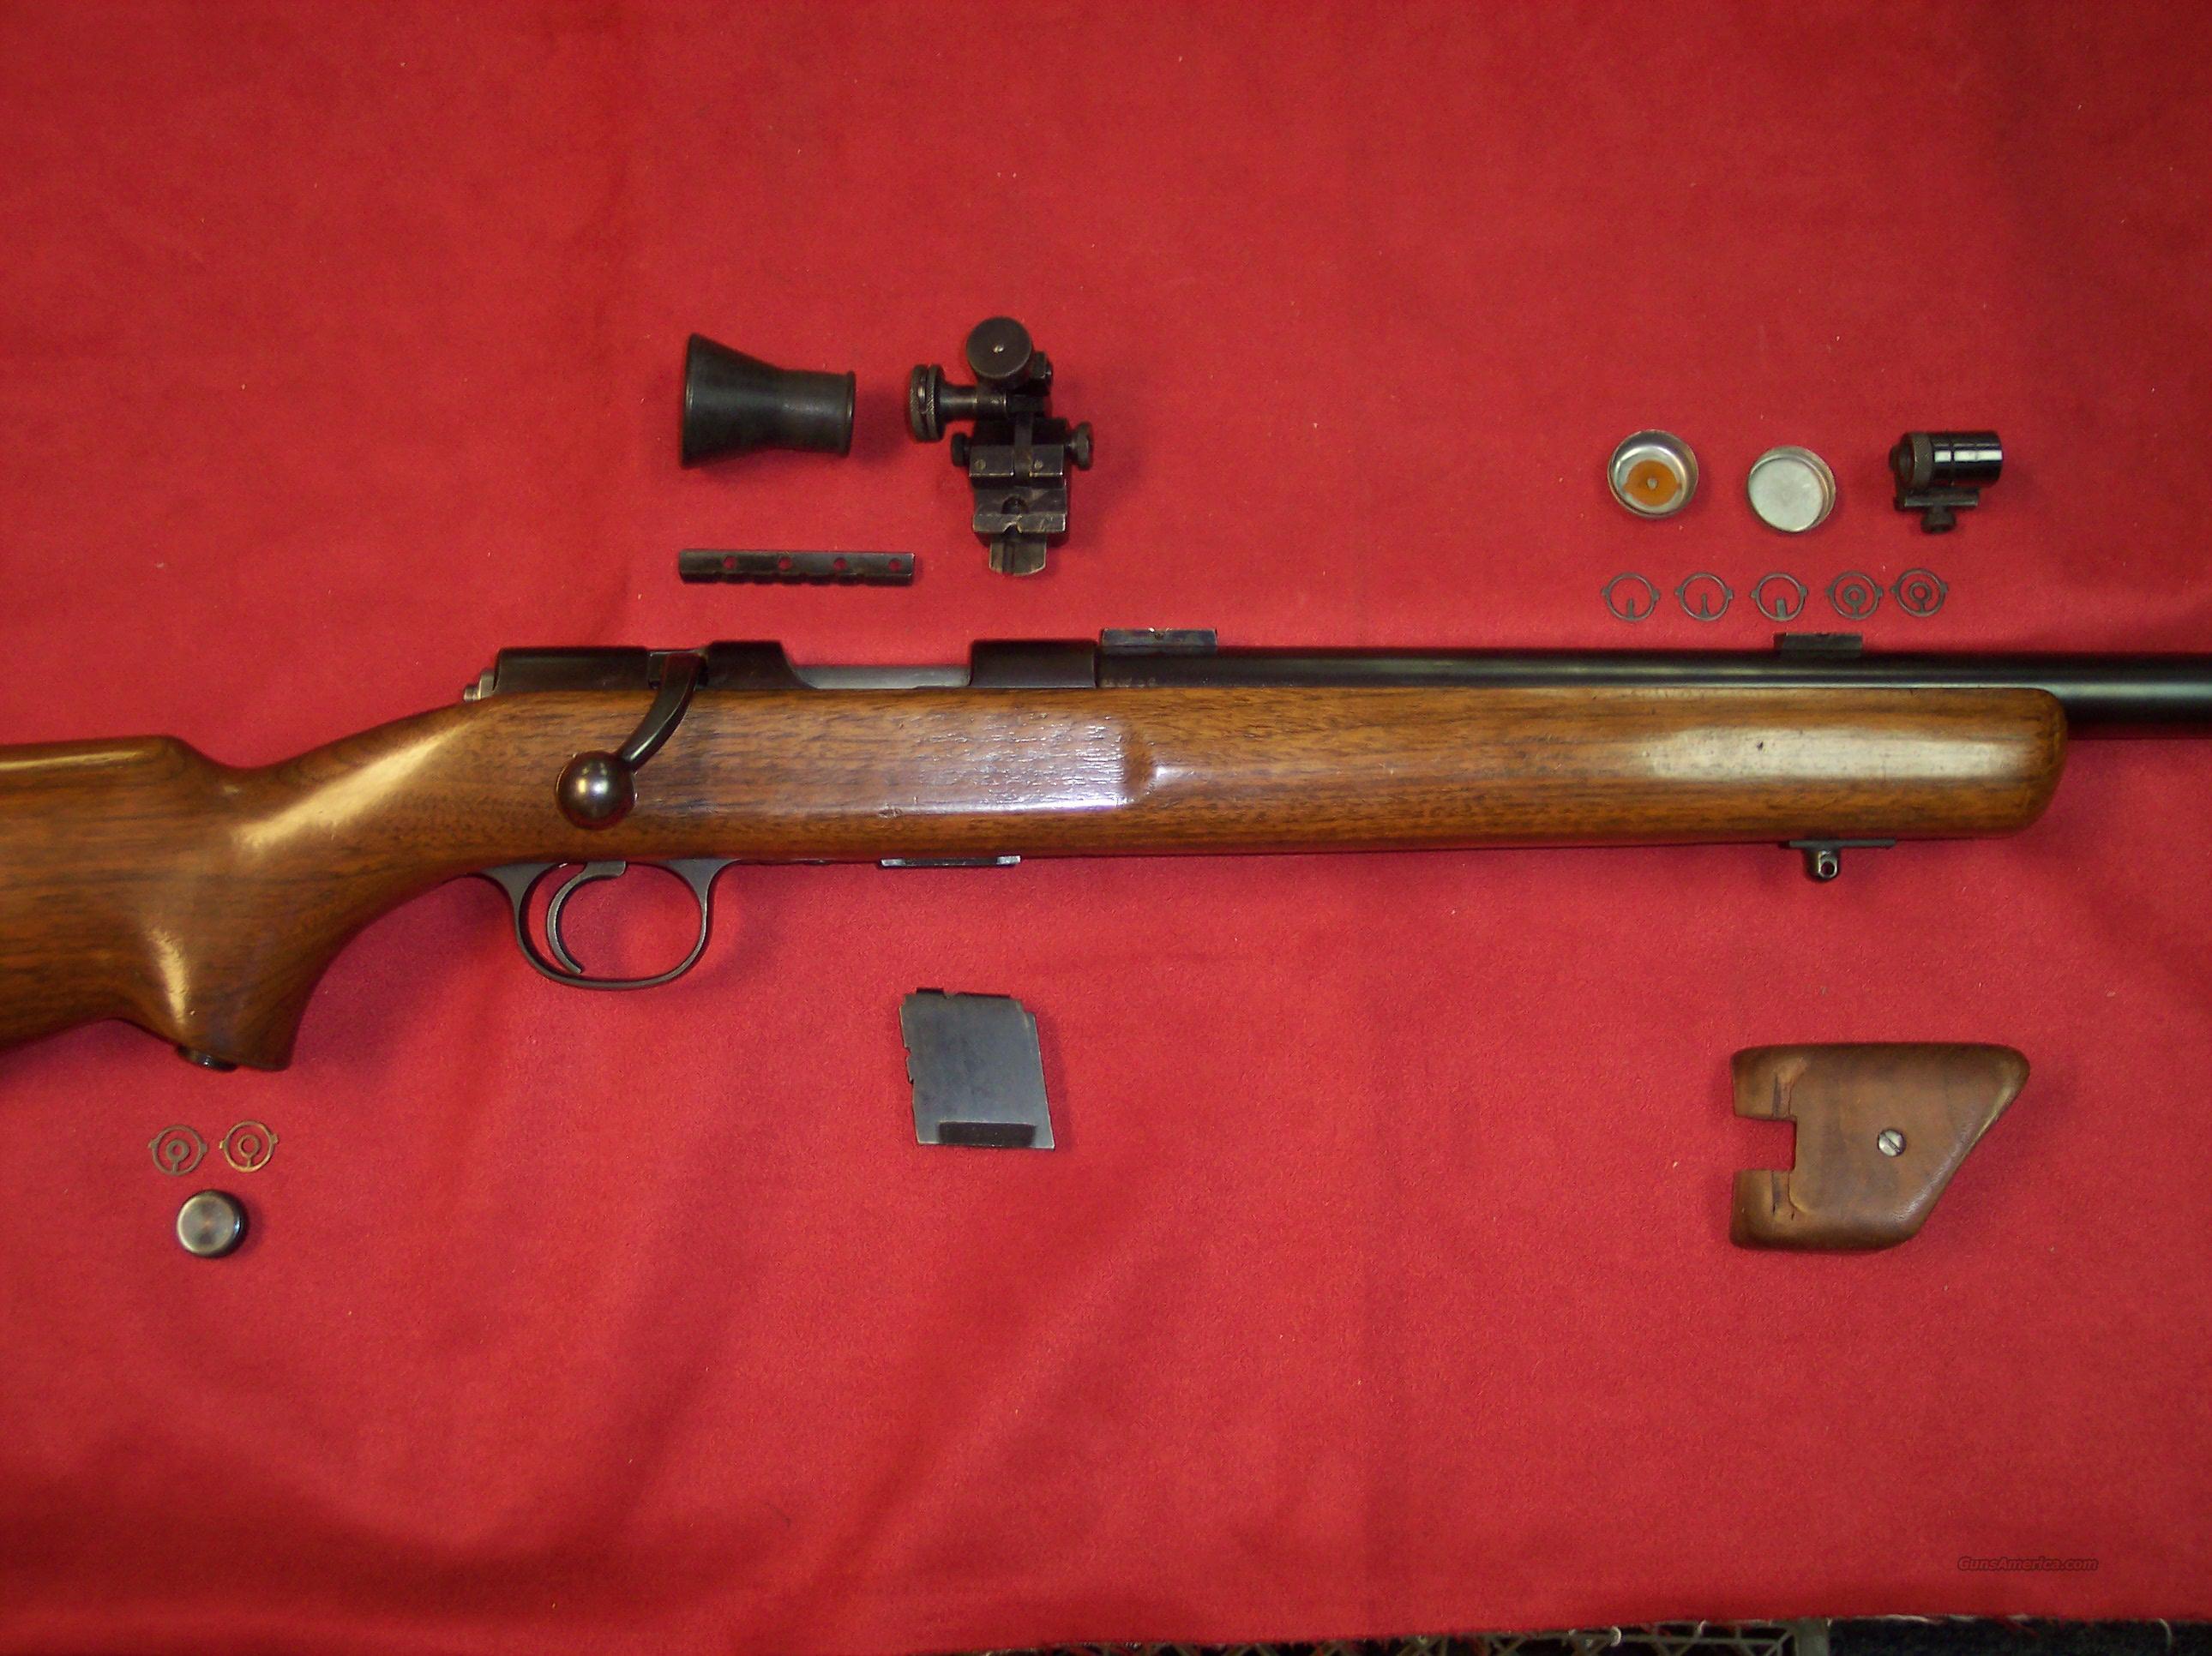 Remington Nylon 66 Images Of Home Design 870 Parts Diagram Get Domain Pictures Getdomainvidscom Mdl 37 Rangemaster 22 Lr Match Rifle For Sale